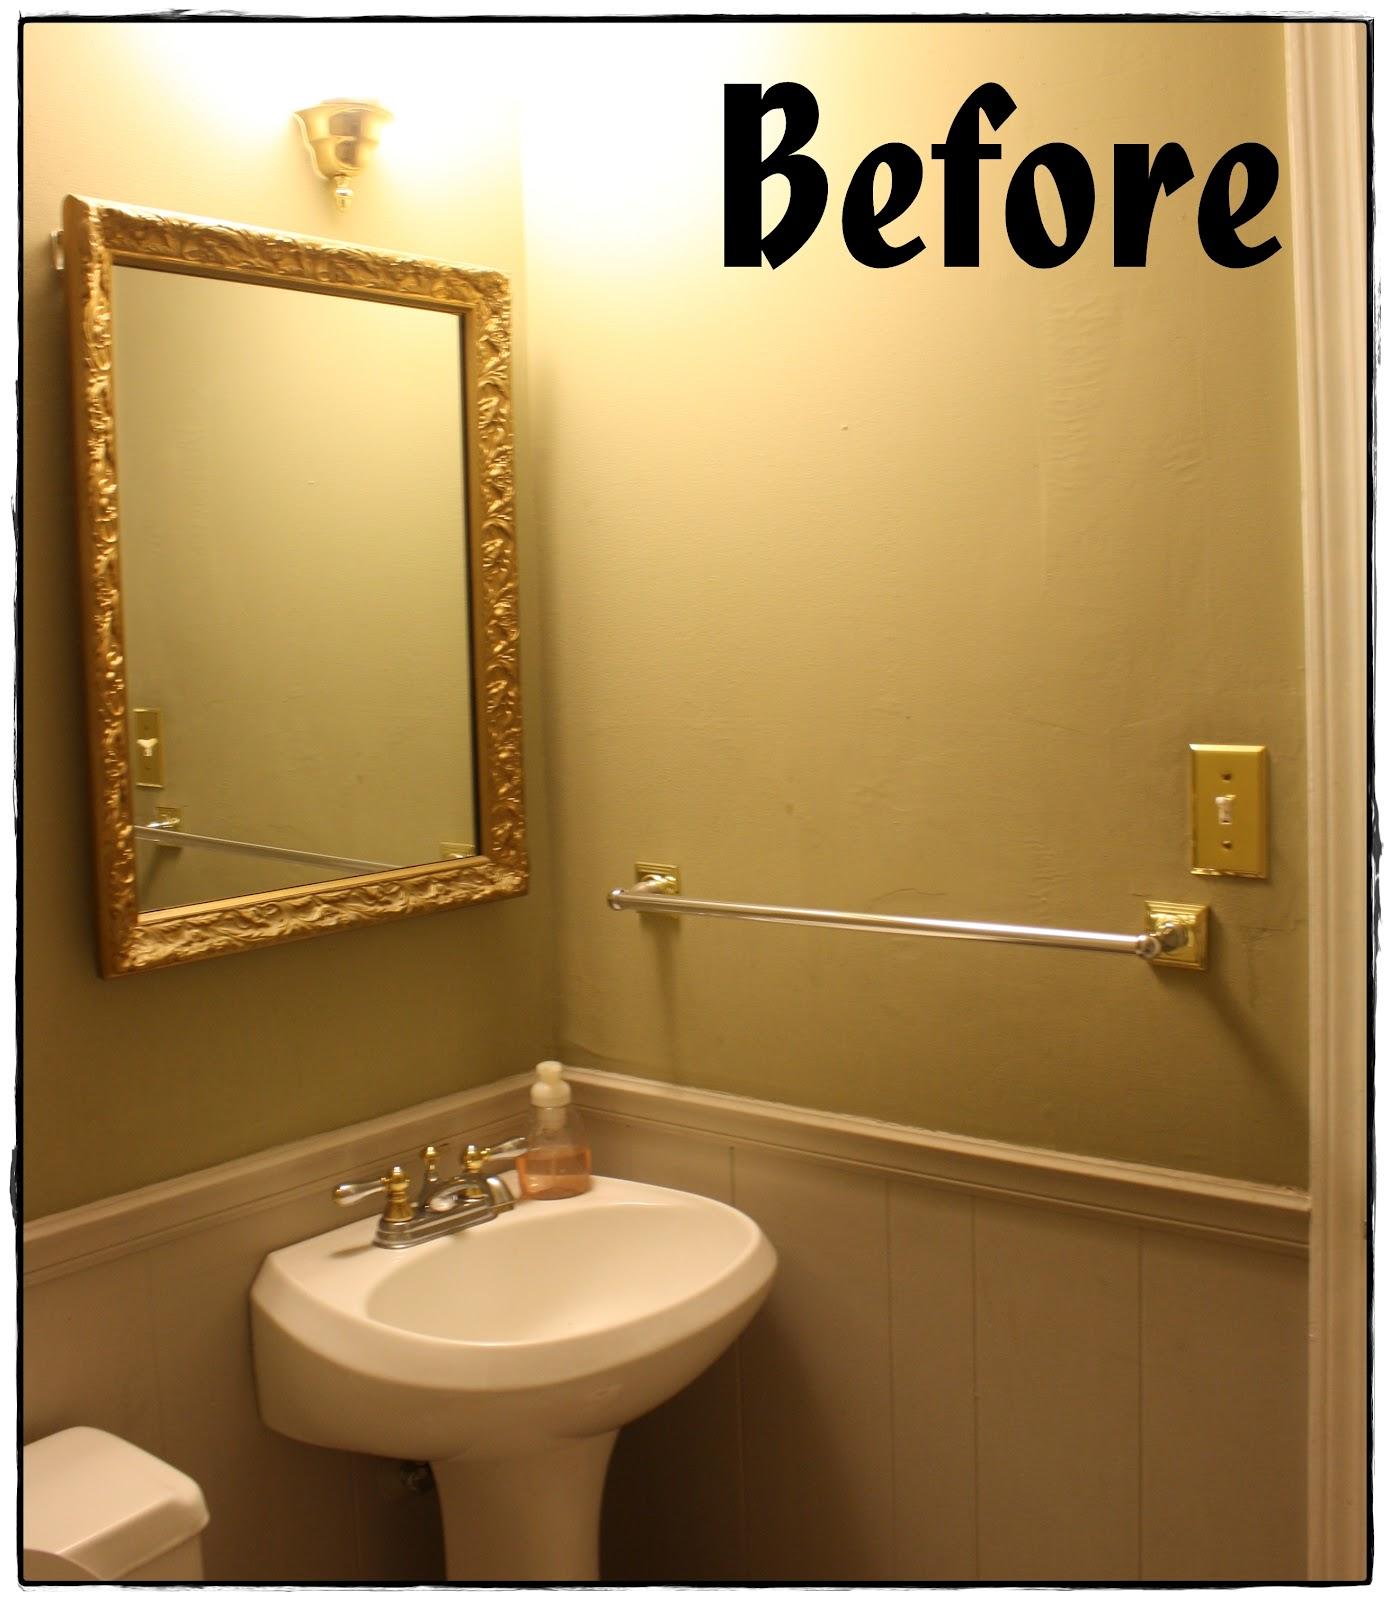 It 39 s my life bathroom redo for Redoing bathroom walls